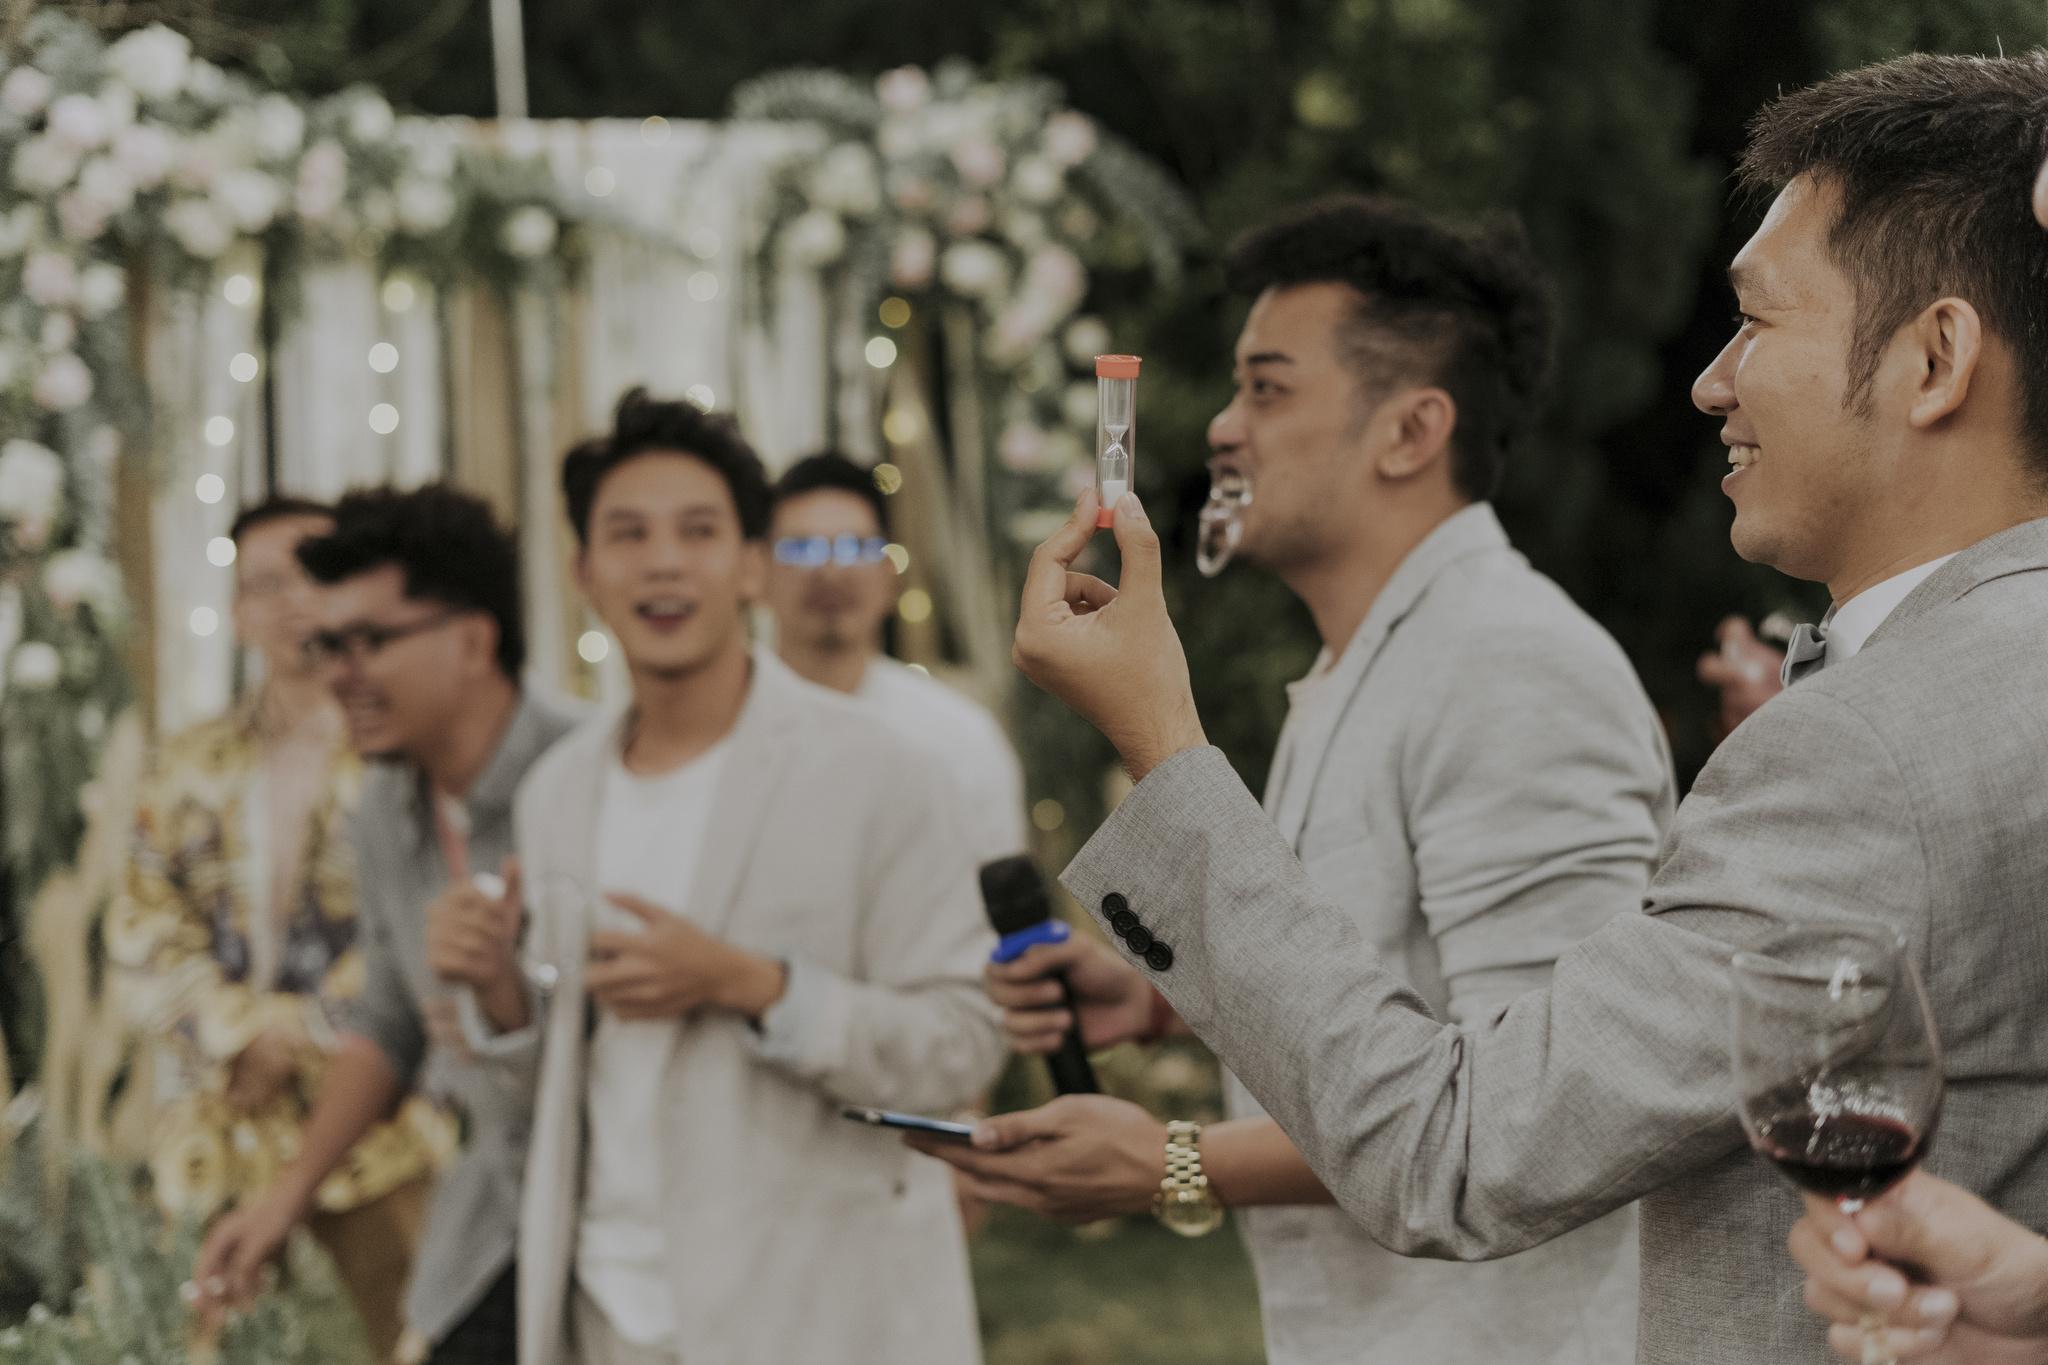 https://huk.s3.amazonaws.com/uploads/image/source/604/Tam_Nam-WD-DL-0058.JPG